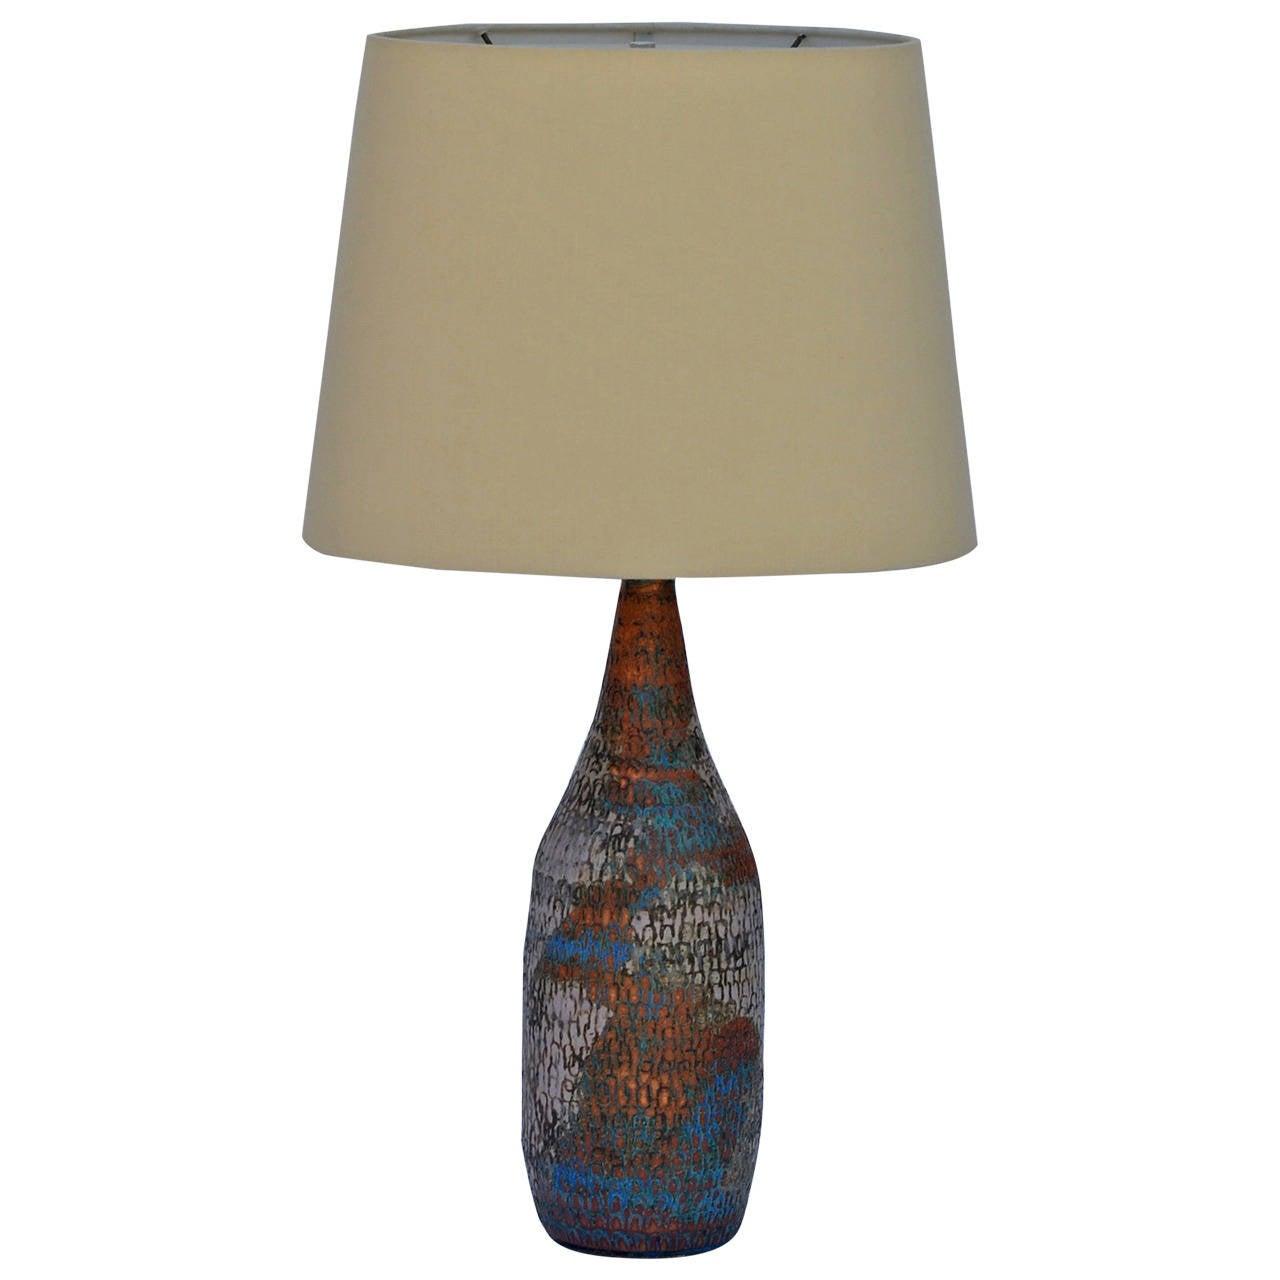 Gourd Shaped Ceramic Studio Lamp With Custom Linen Shade